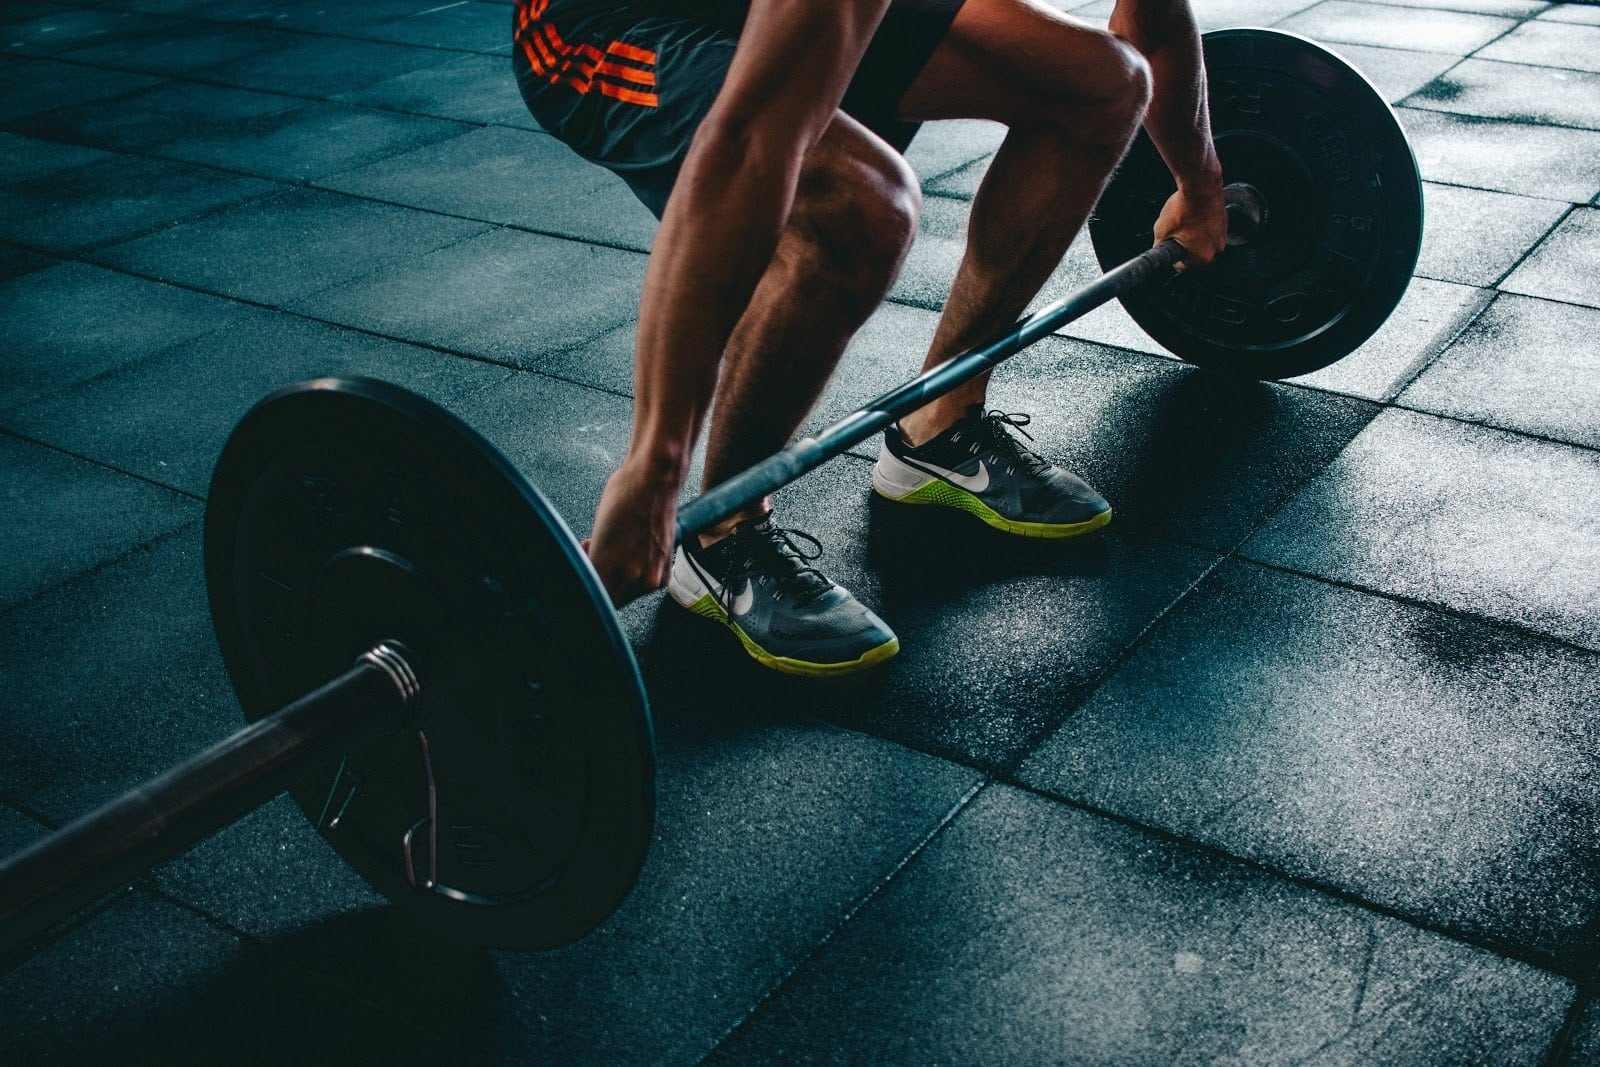 weightlifter preparing to deadlift